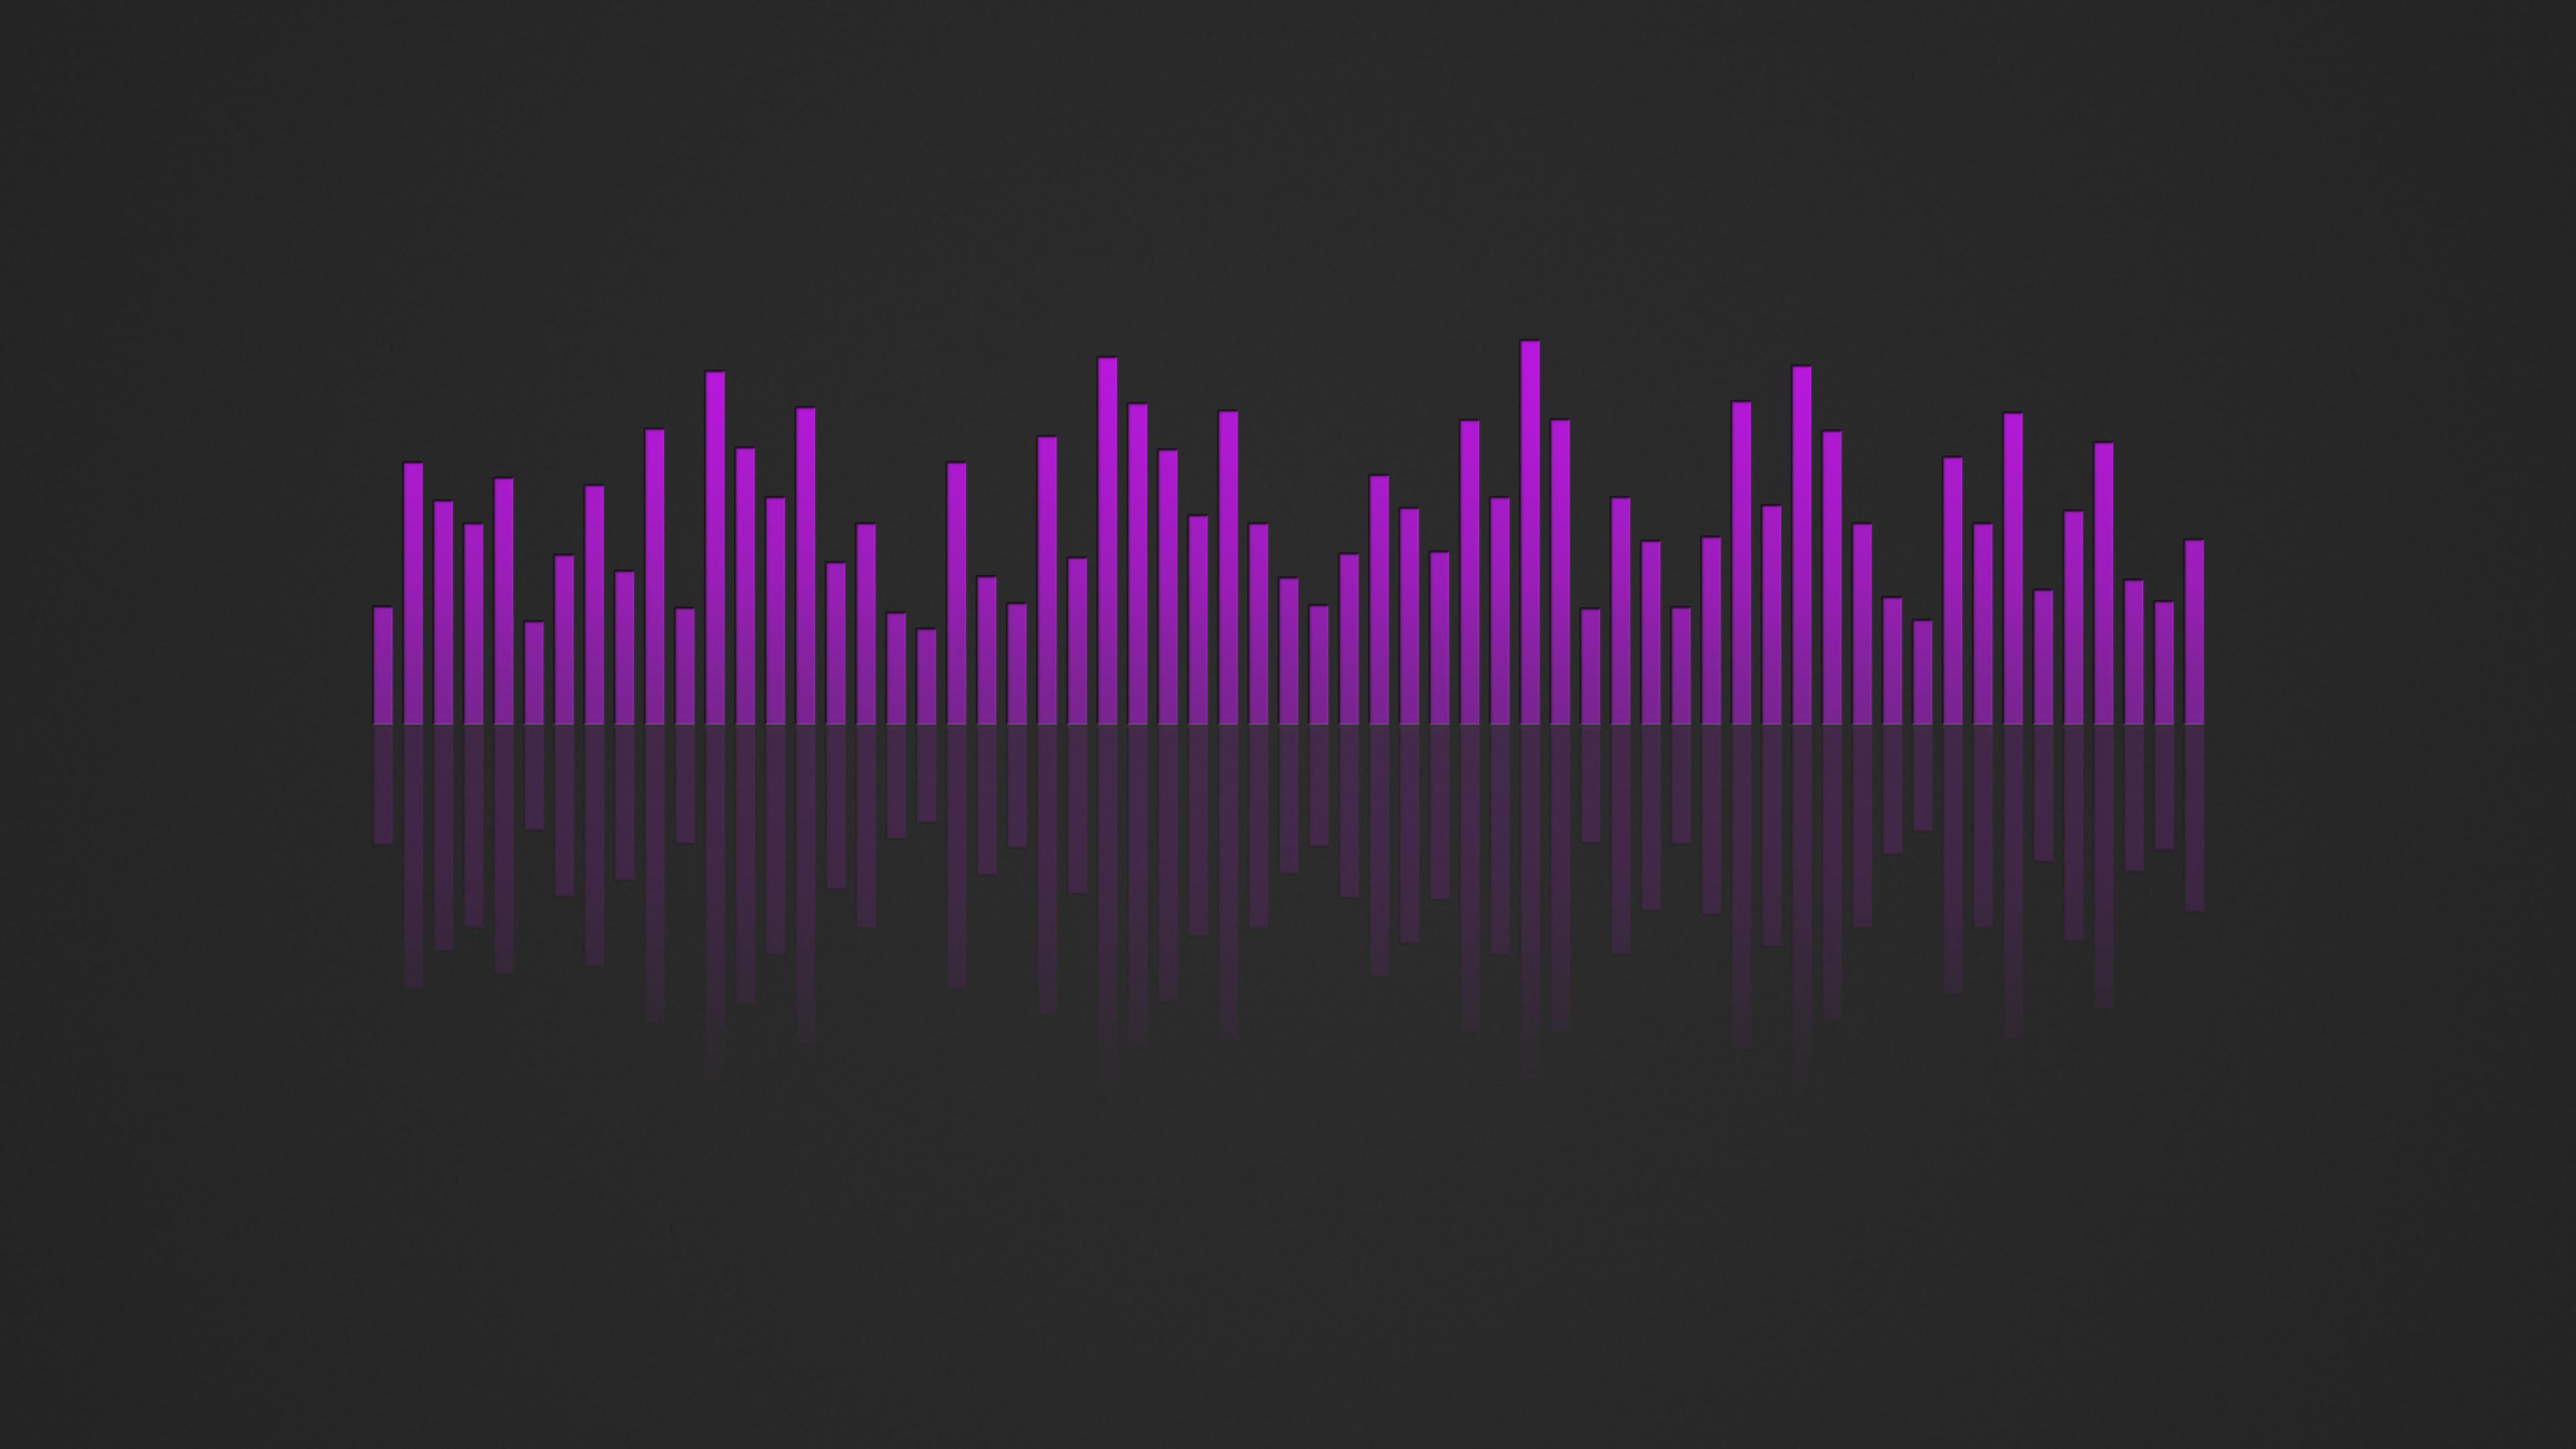 Music Visualizer 4k Wallpaper Purple By Rv770 On Deviantart